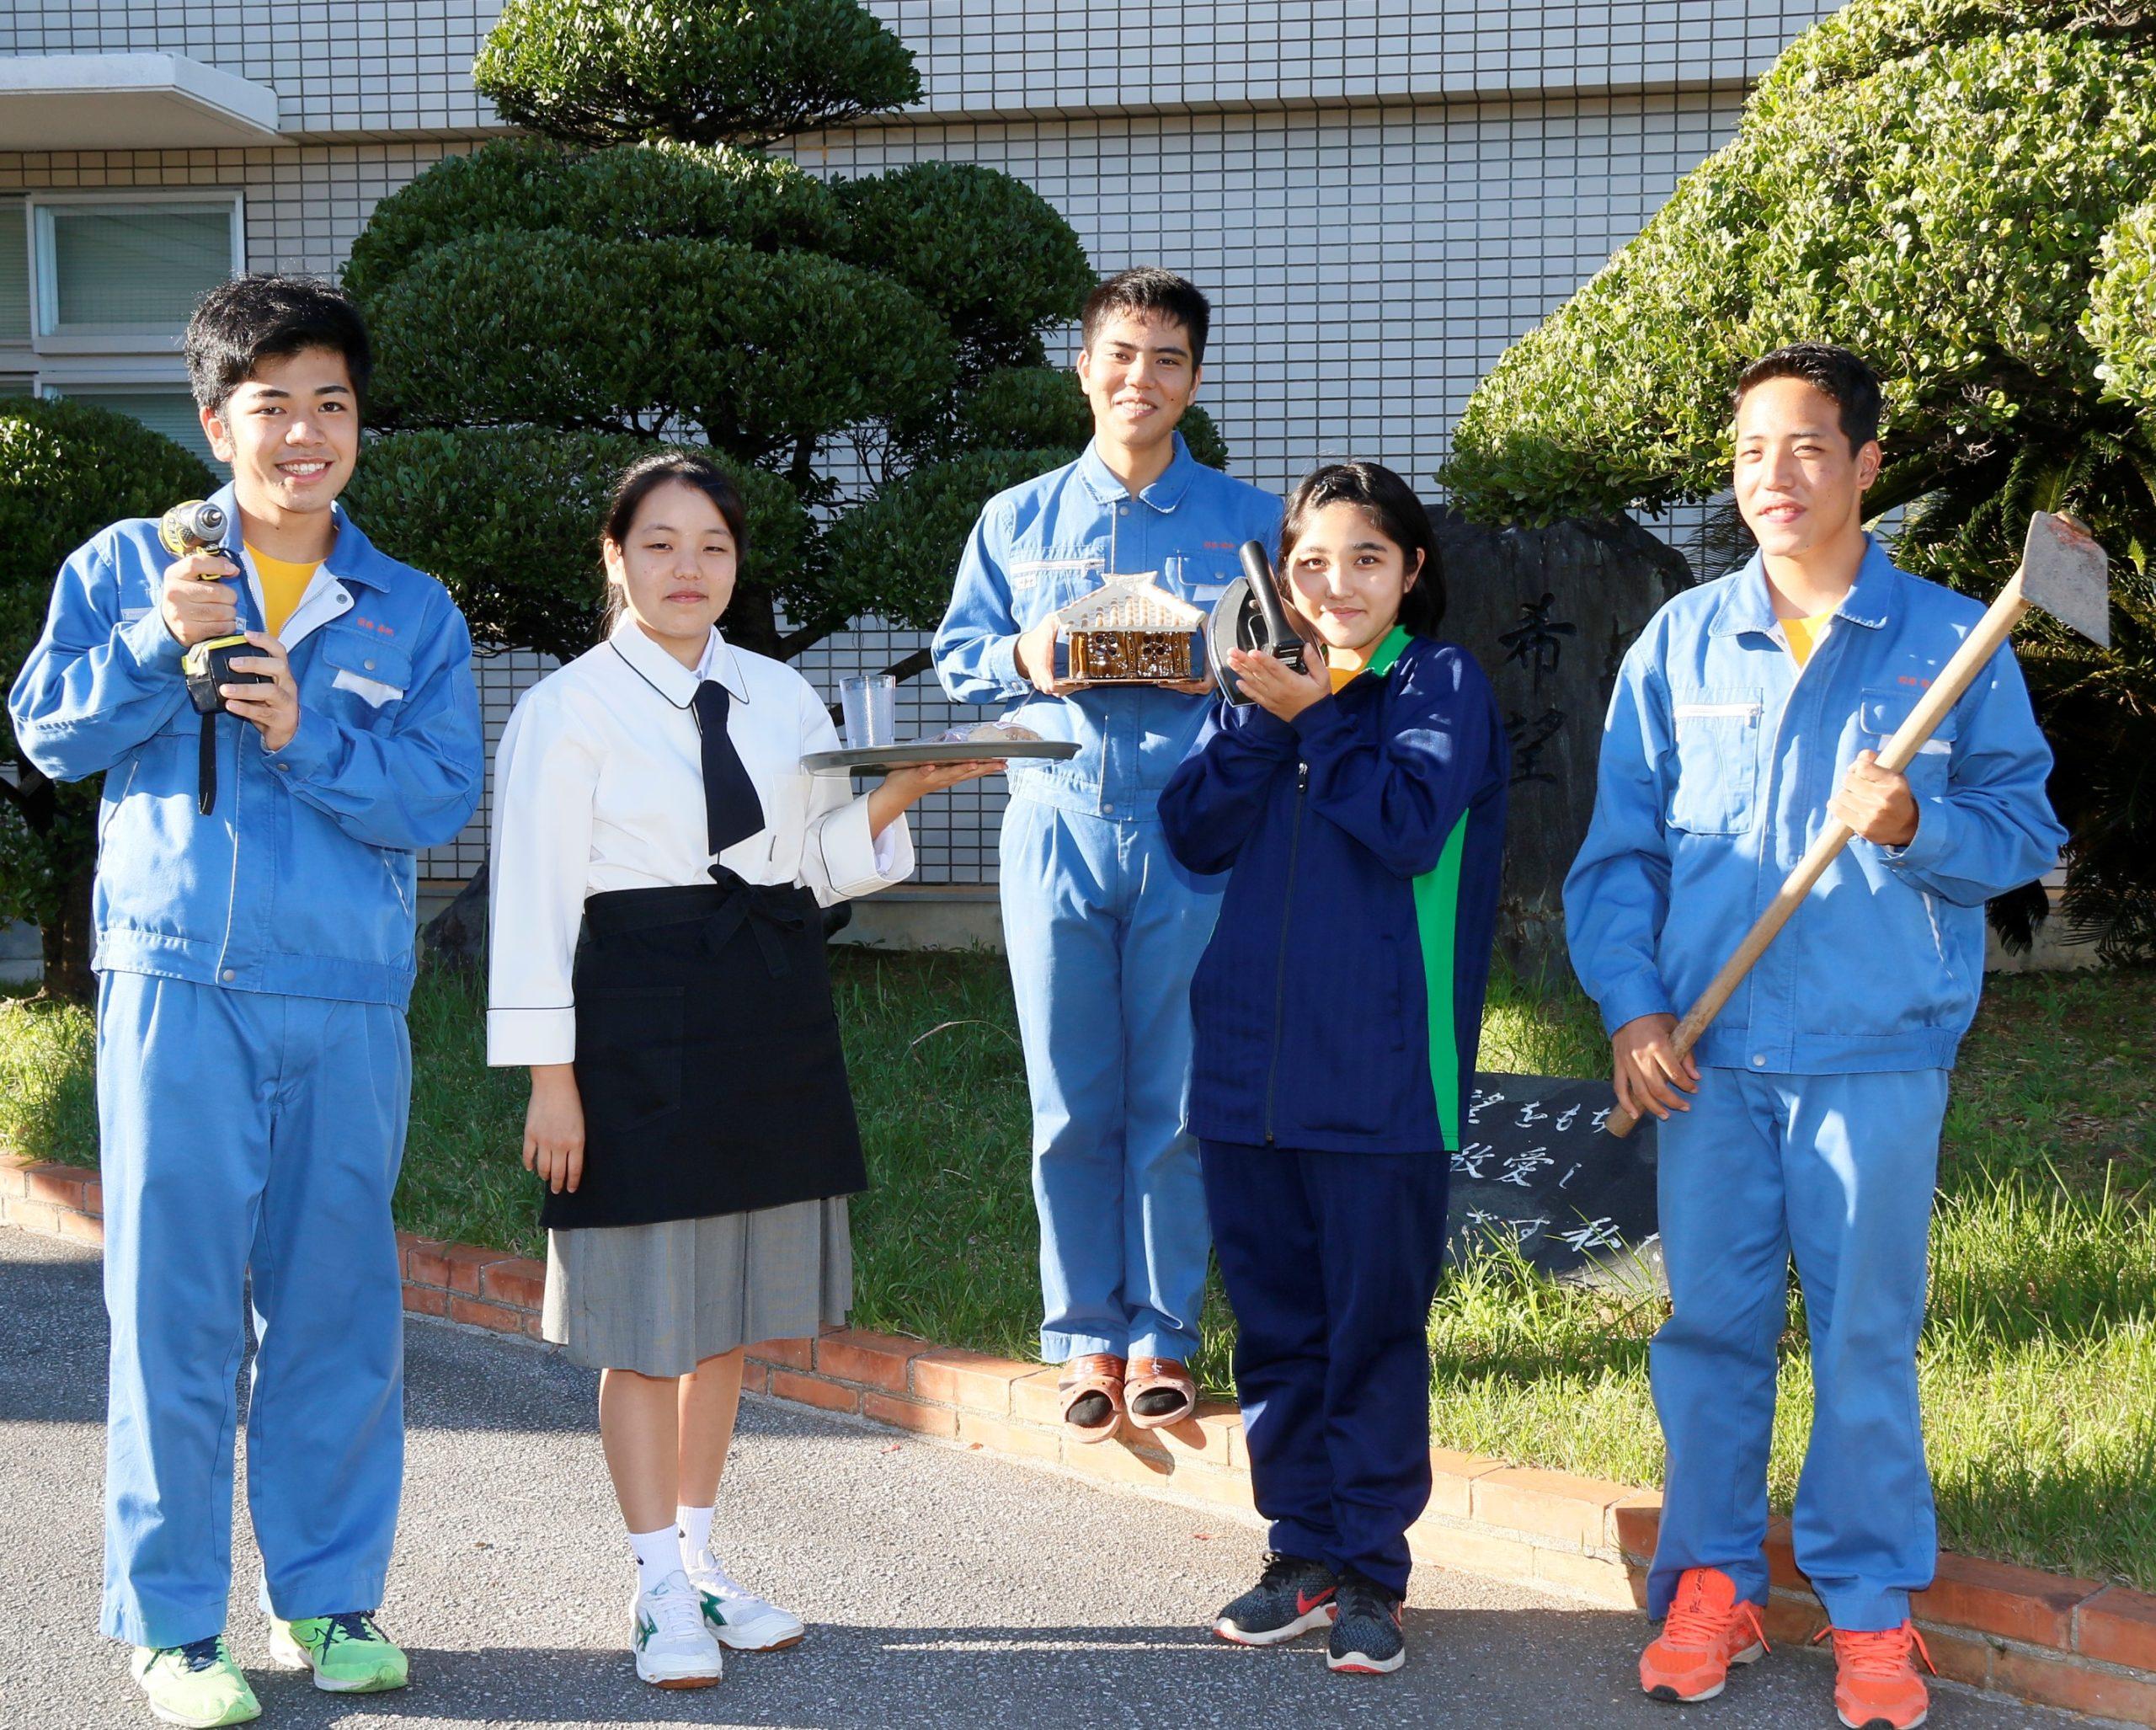 A-沖縄高等特別支援学校Aメイン画像-scaled.jpg